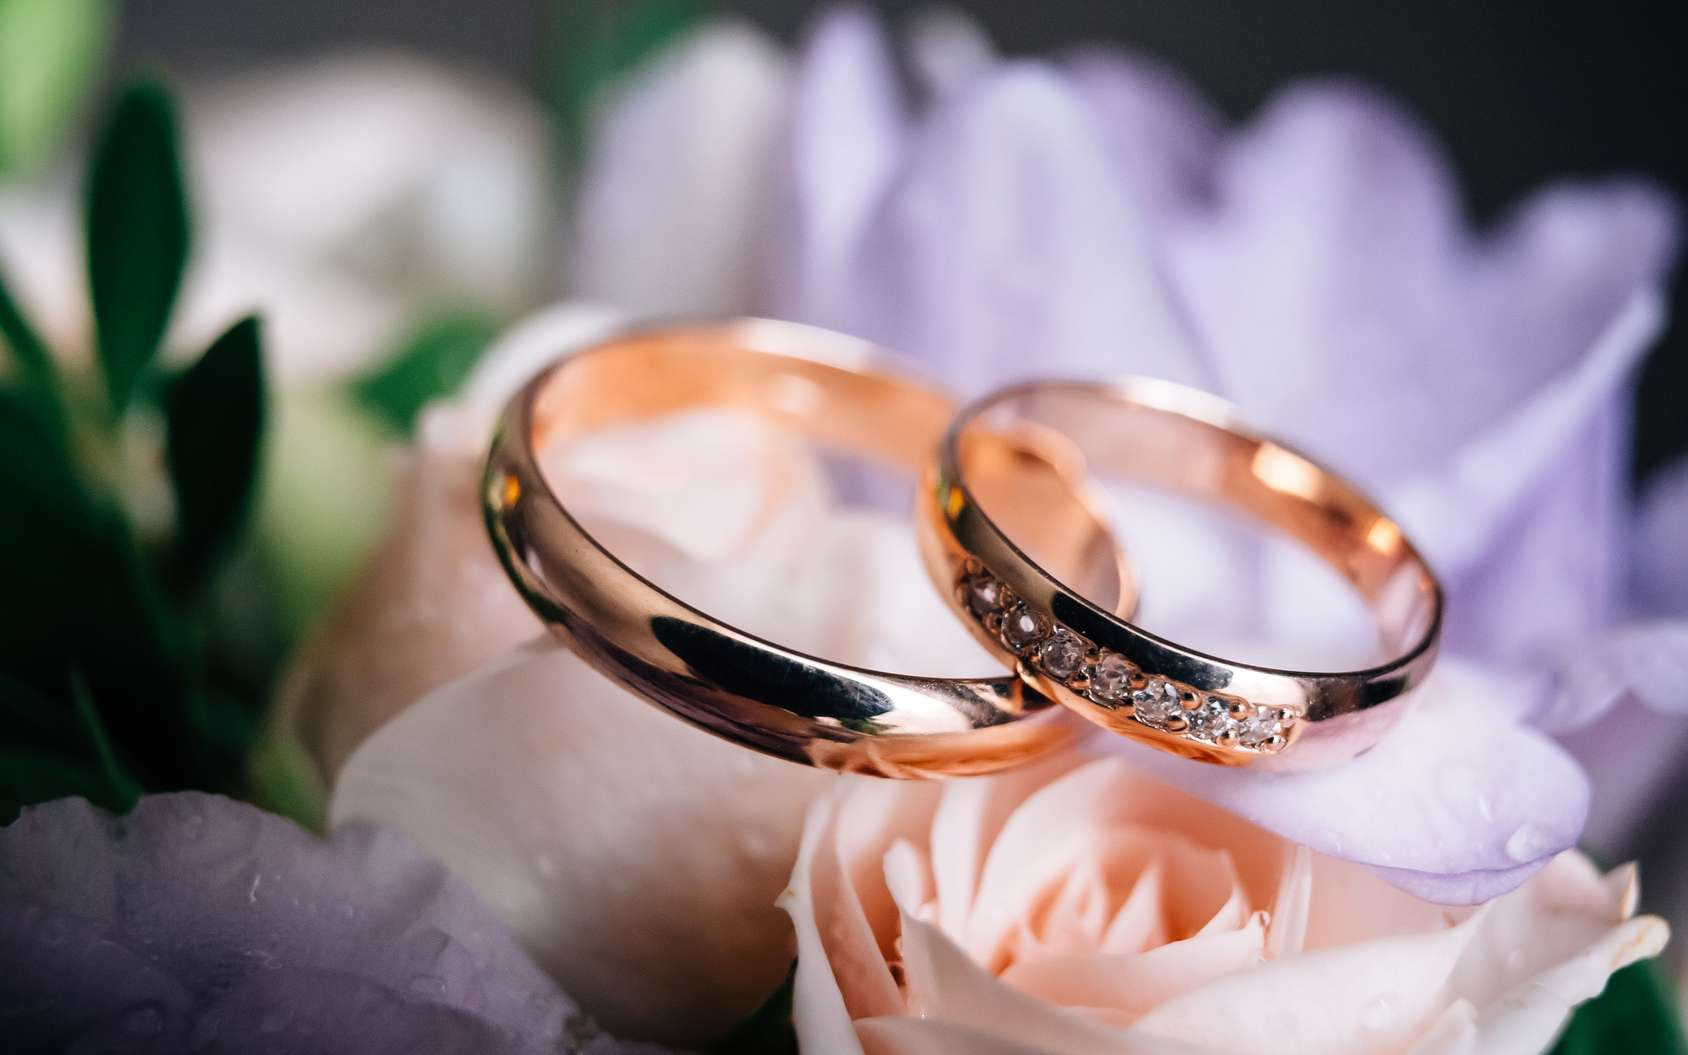 Quel Contrat De Mariage Choisir